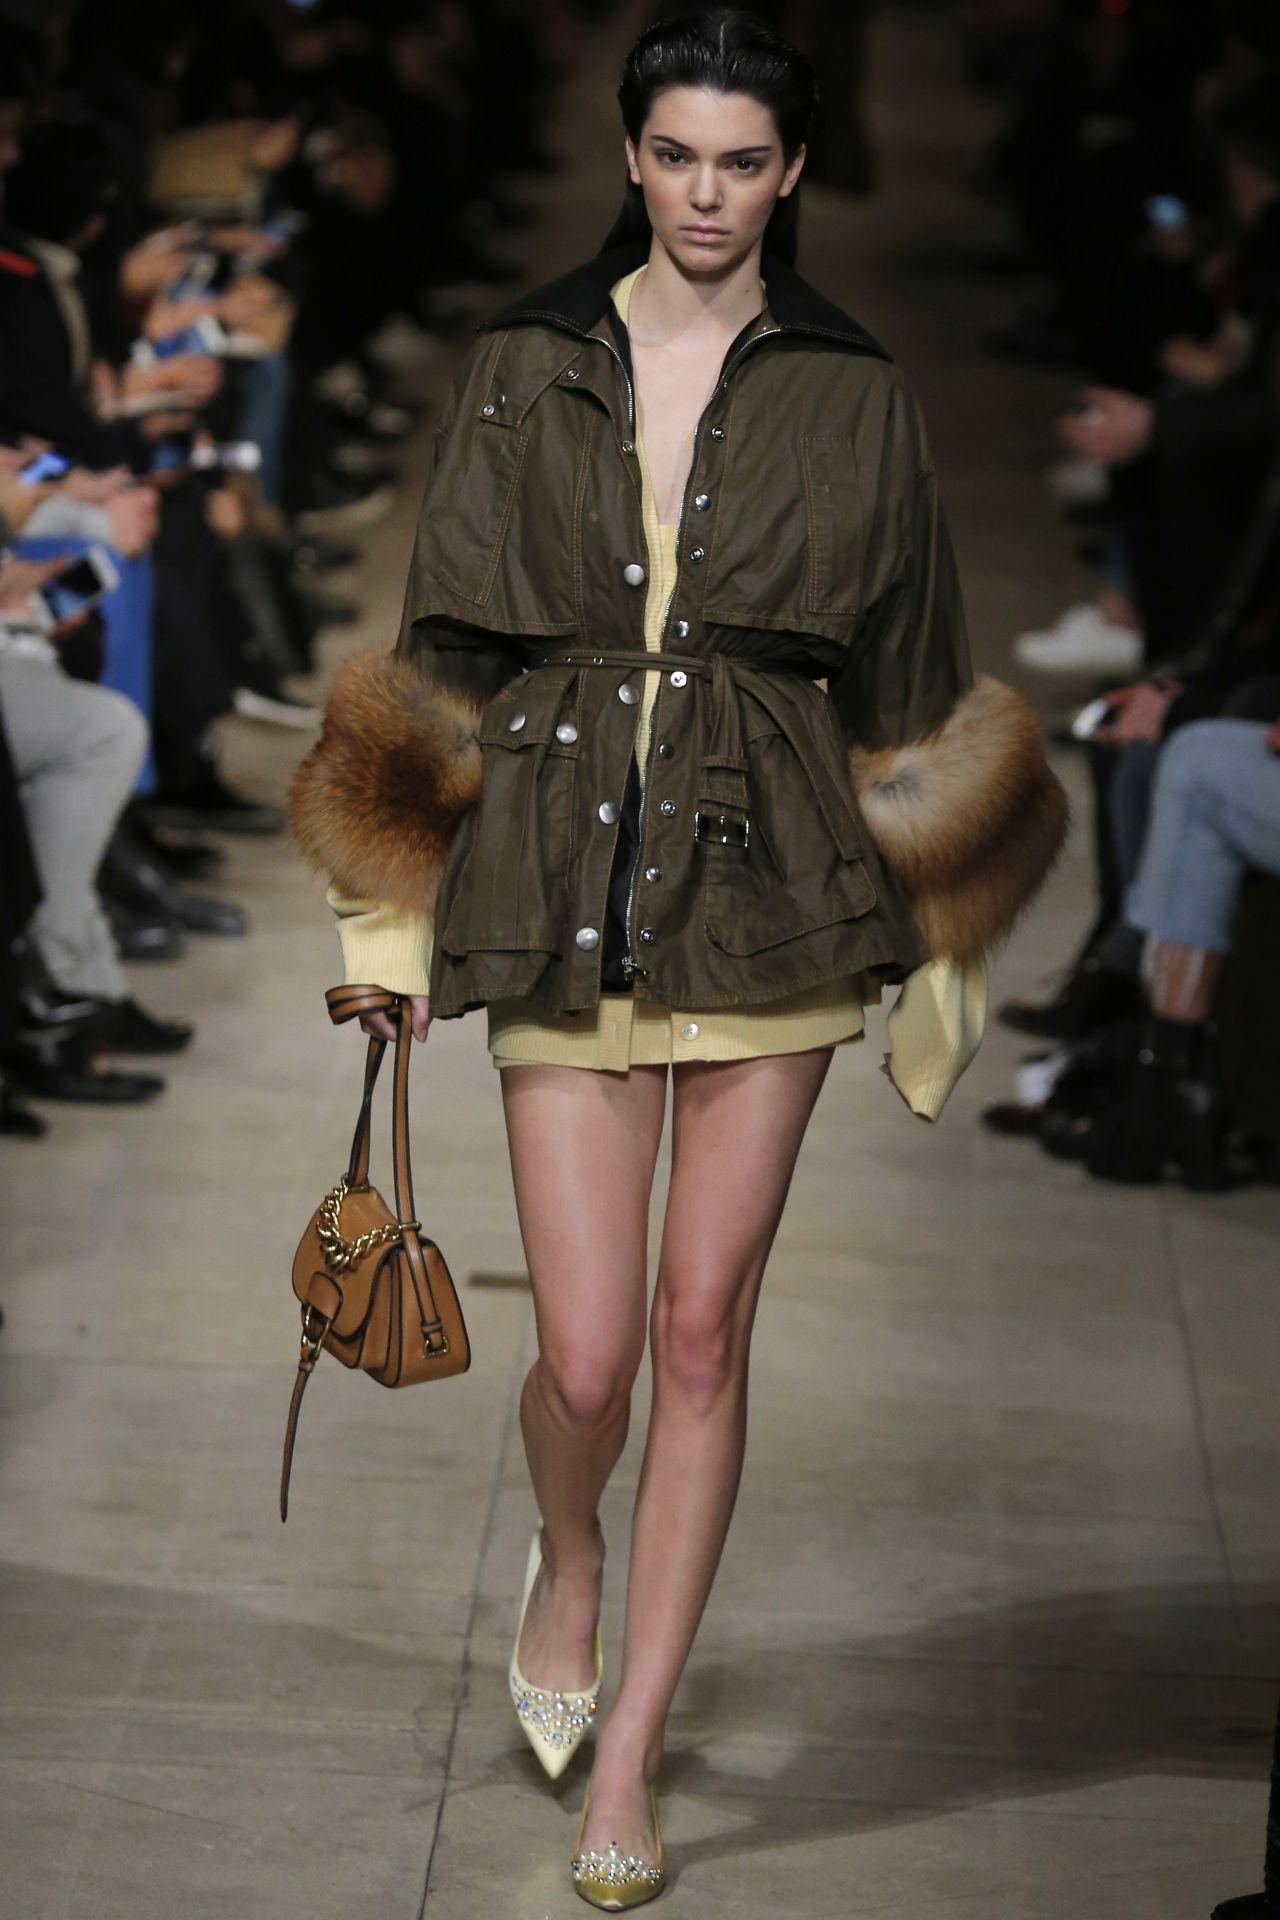 Kendall jenner walks miu miu show paris fashion week - 2019 year